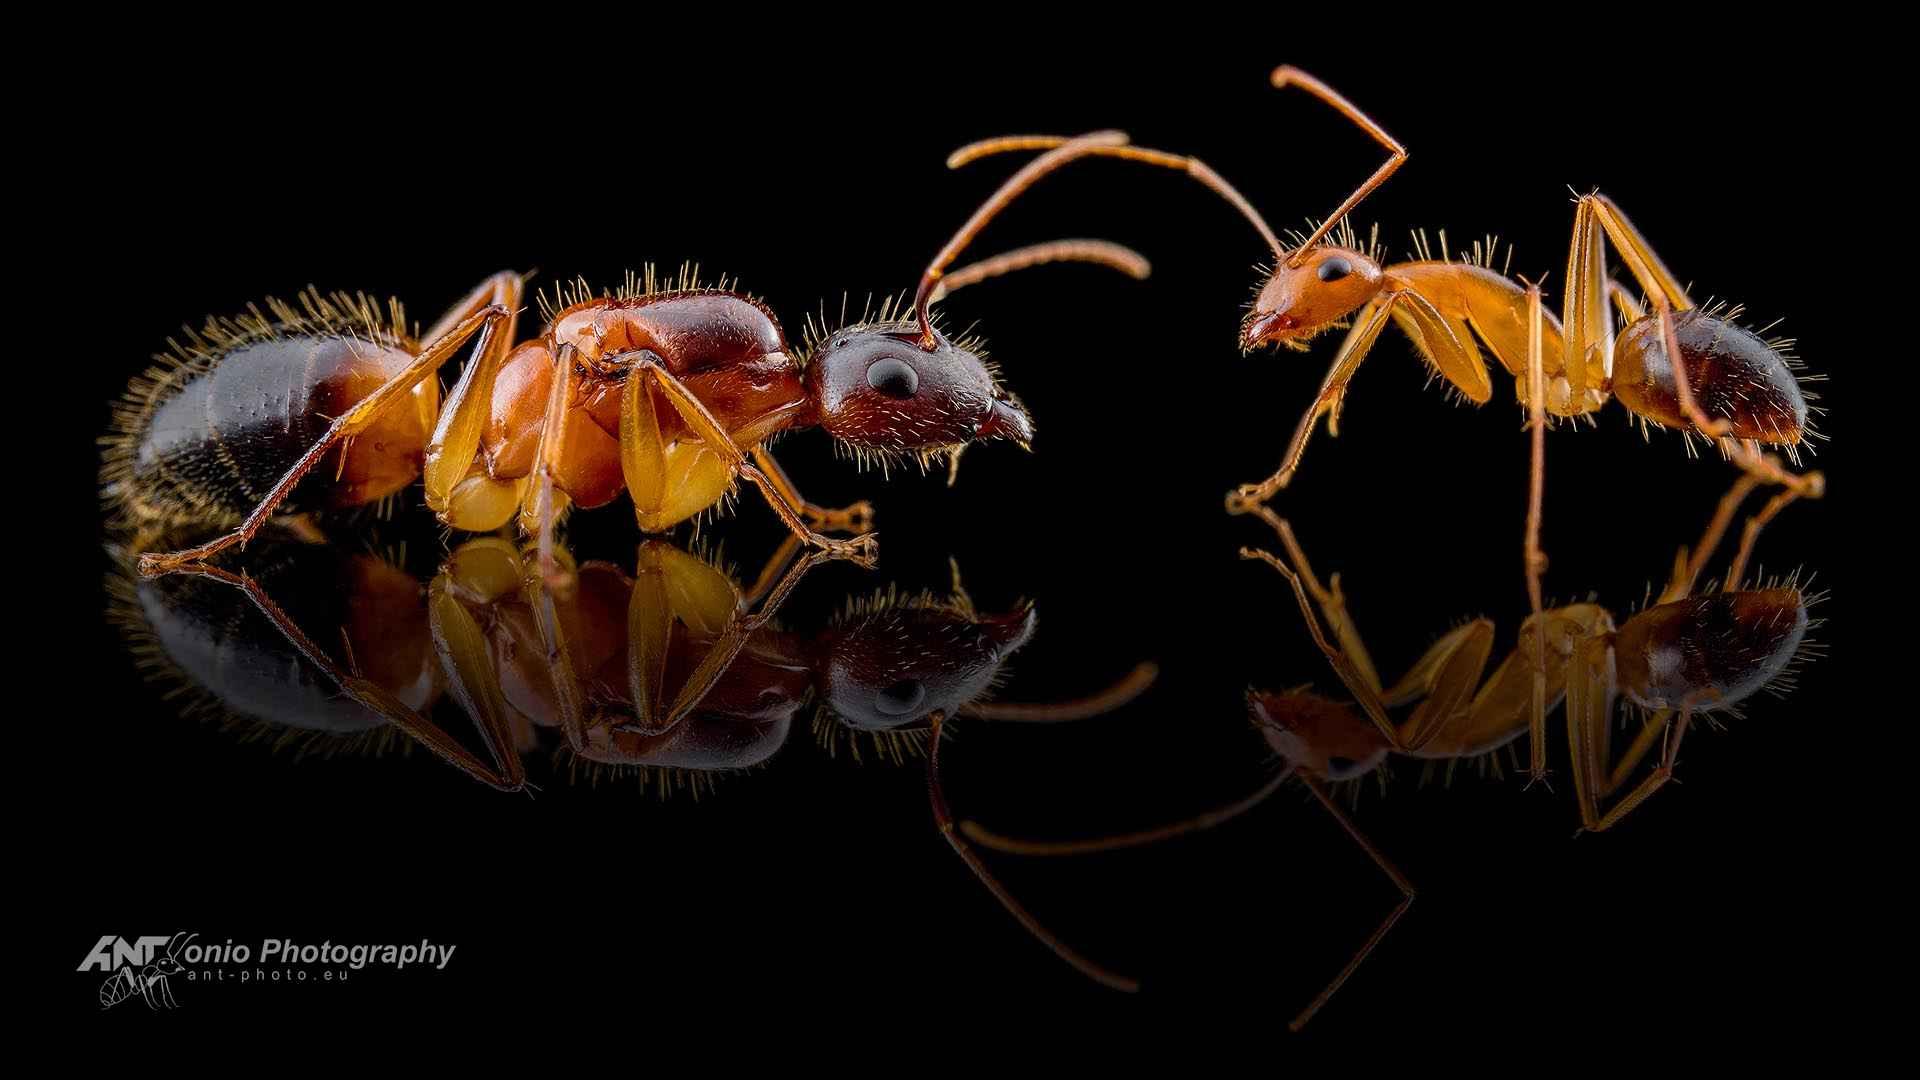 Camponotus pseudoirrytans